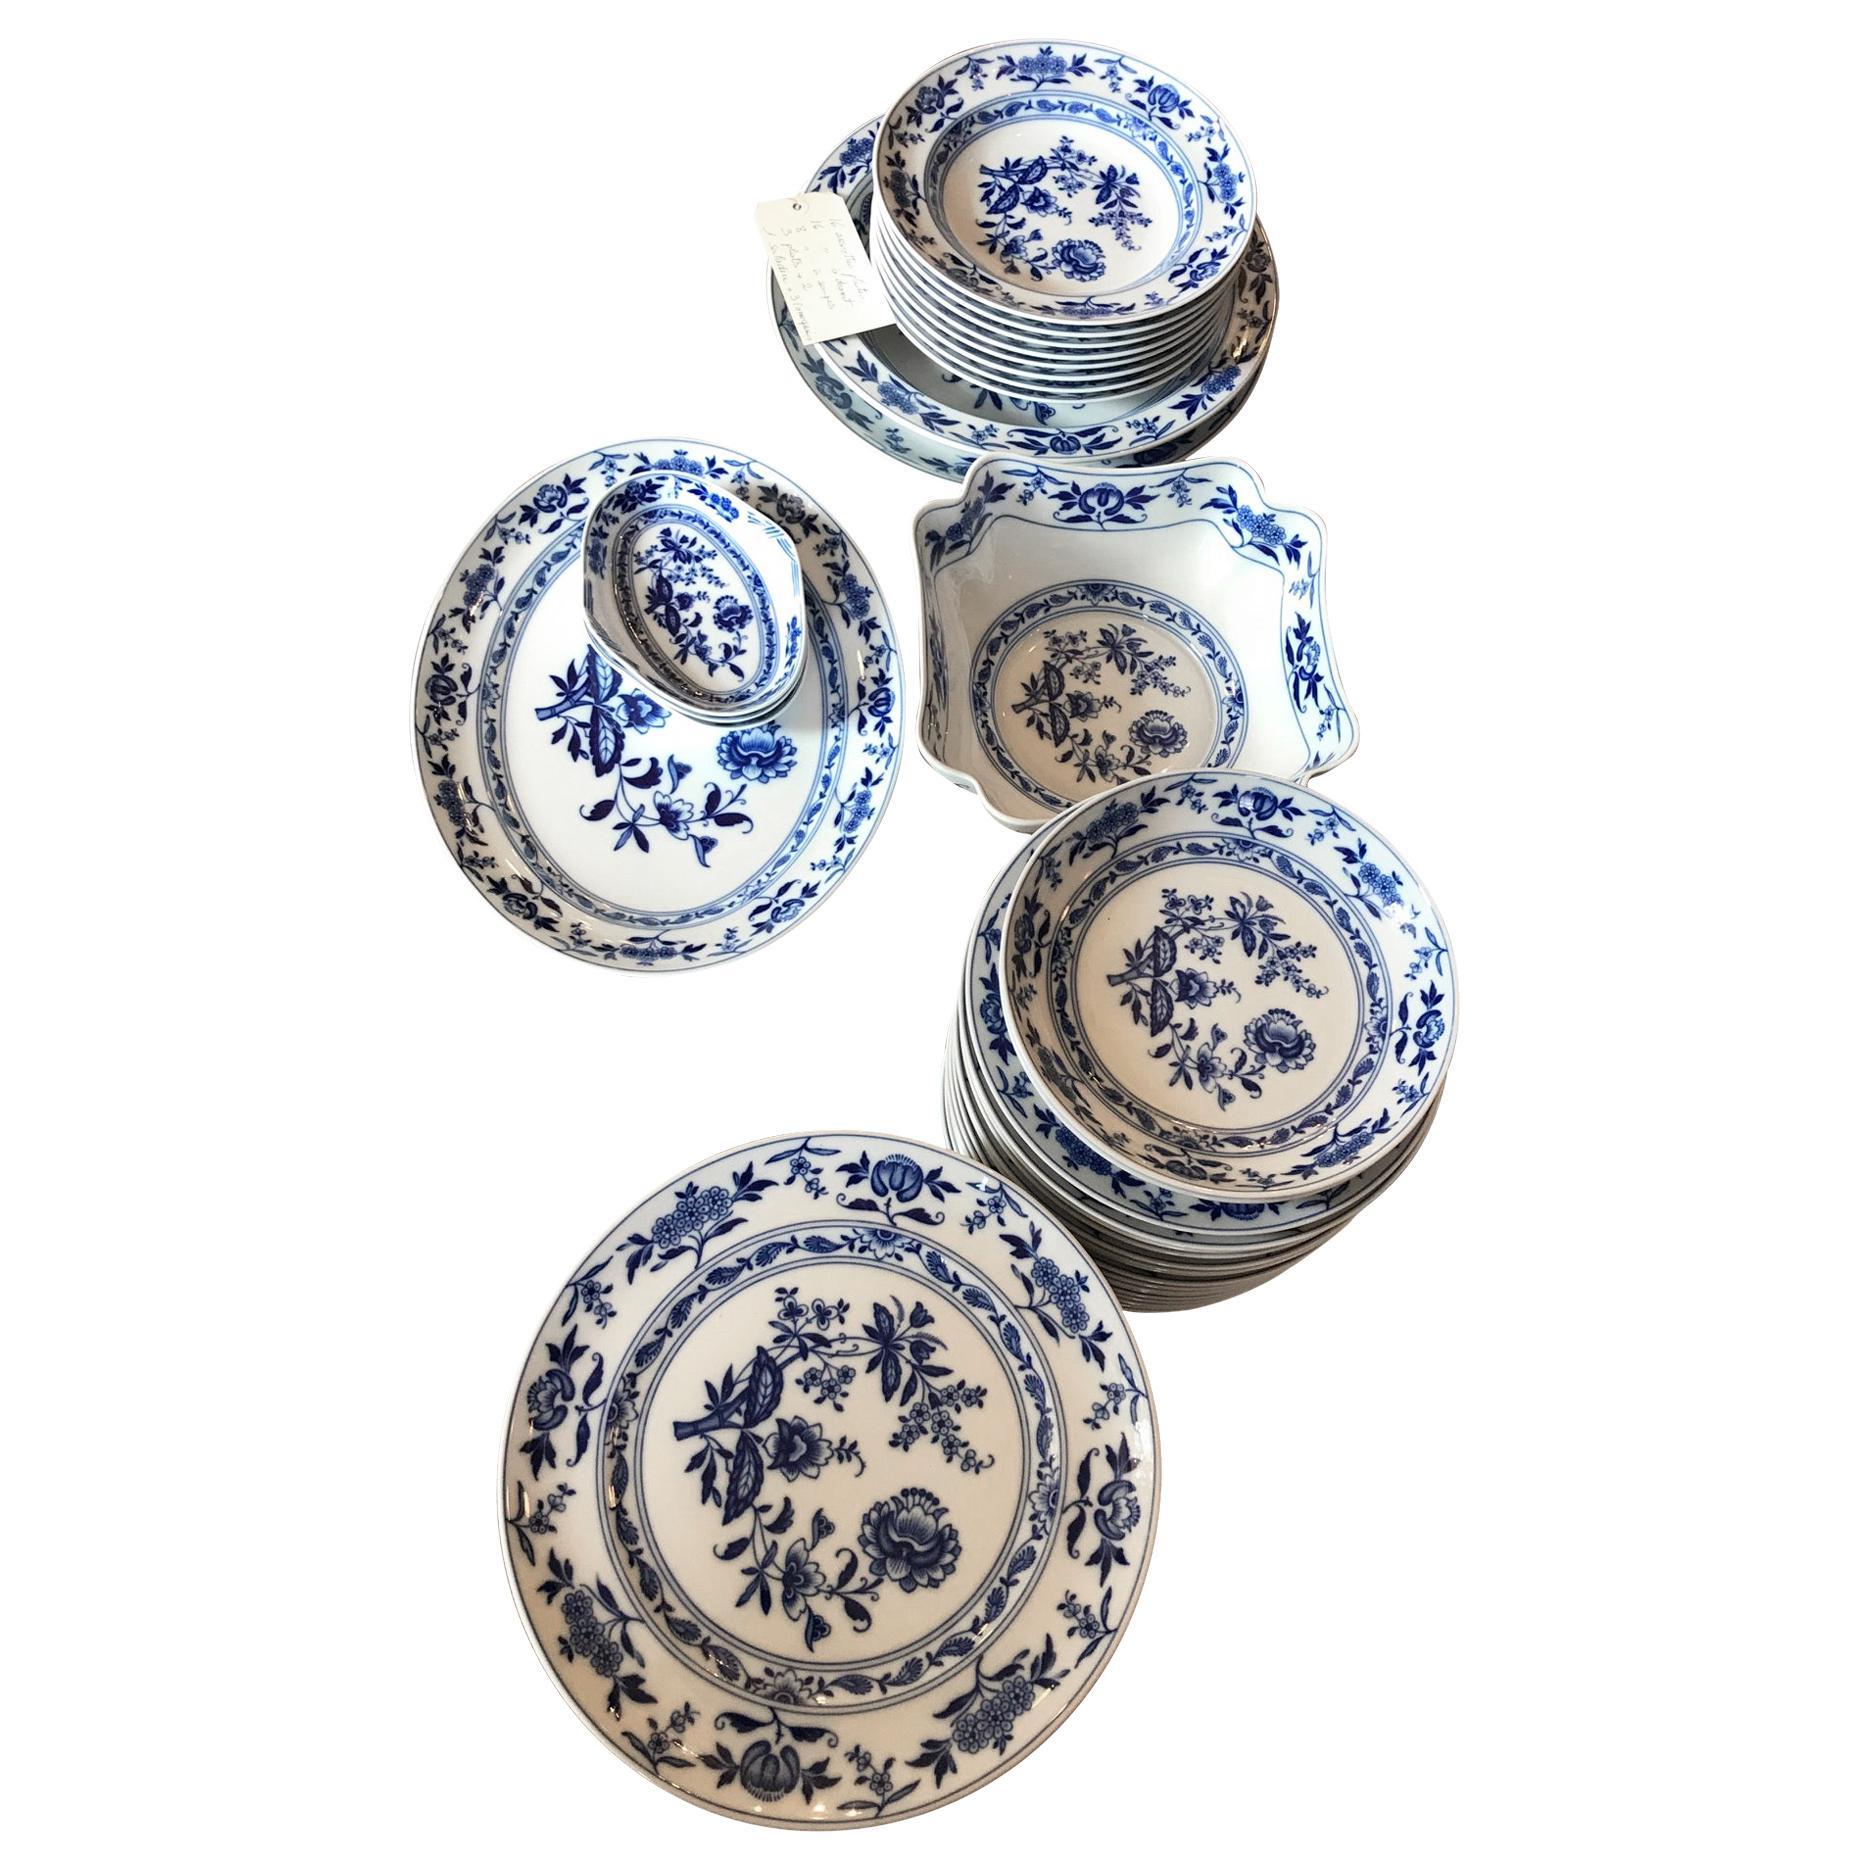 Hand Painted Vista Alegre Porcelain Tableware